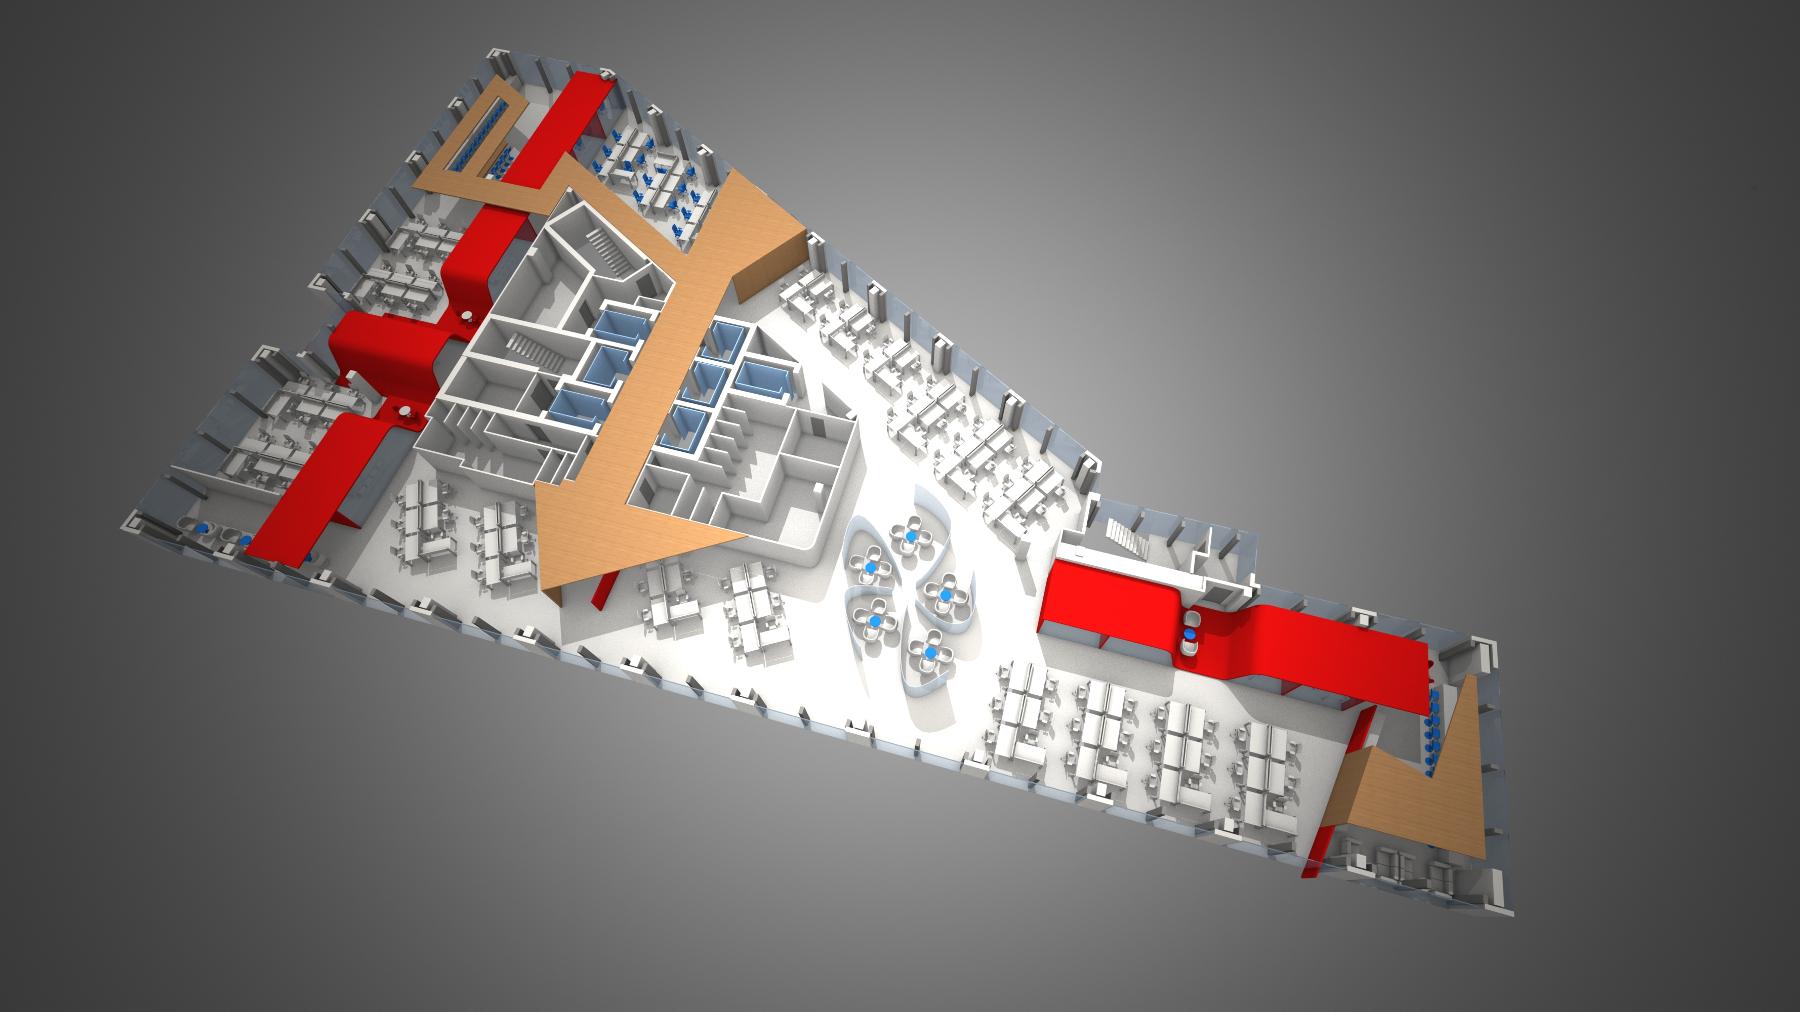 Google office campus masterplan upper levels